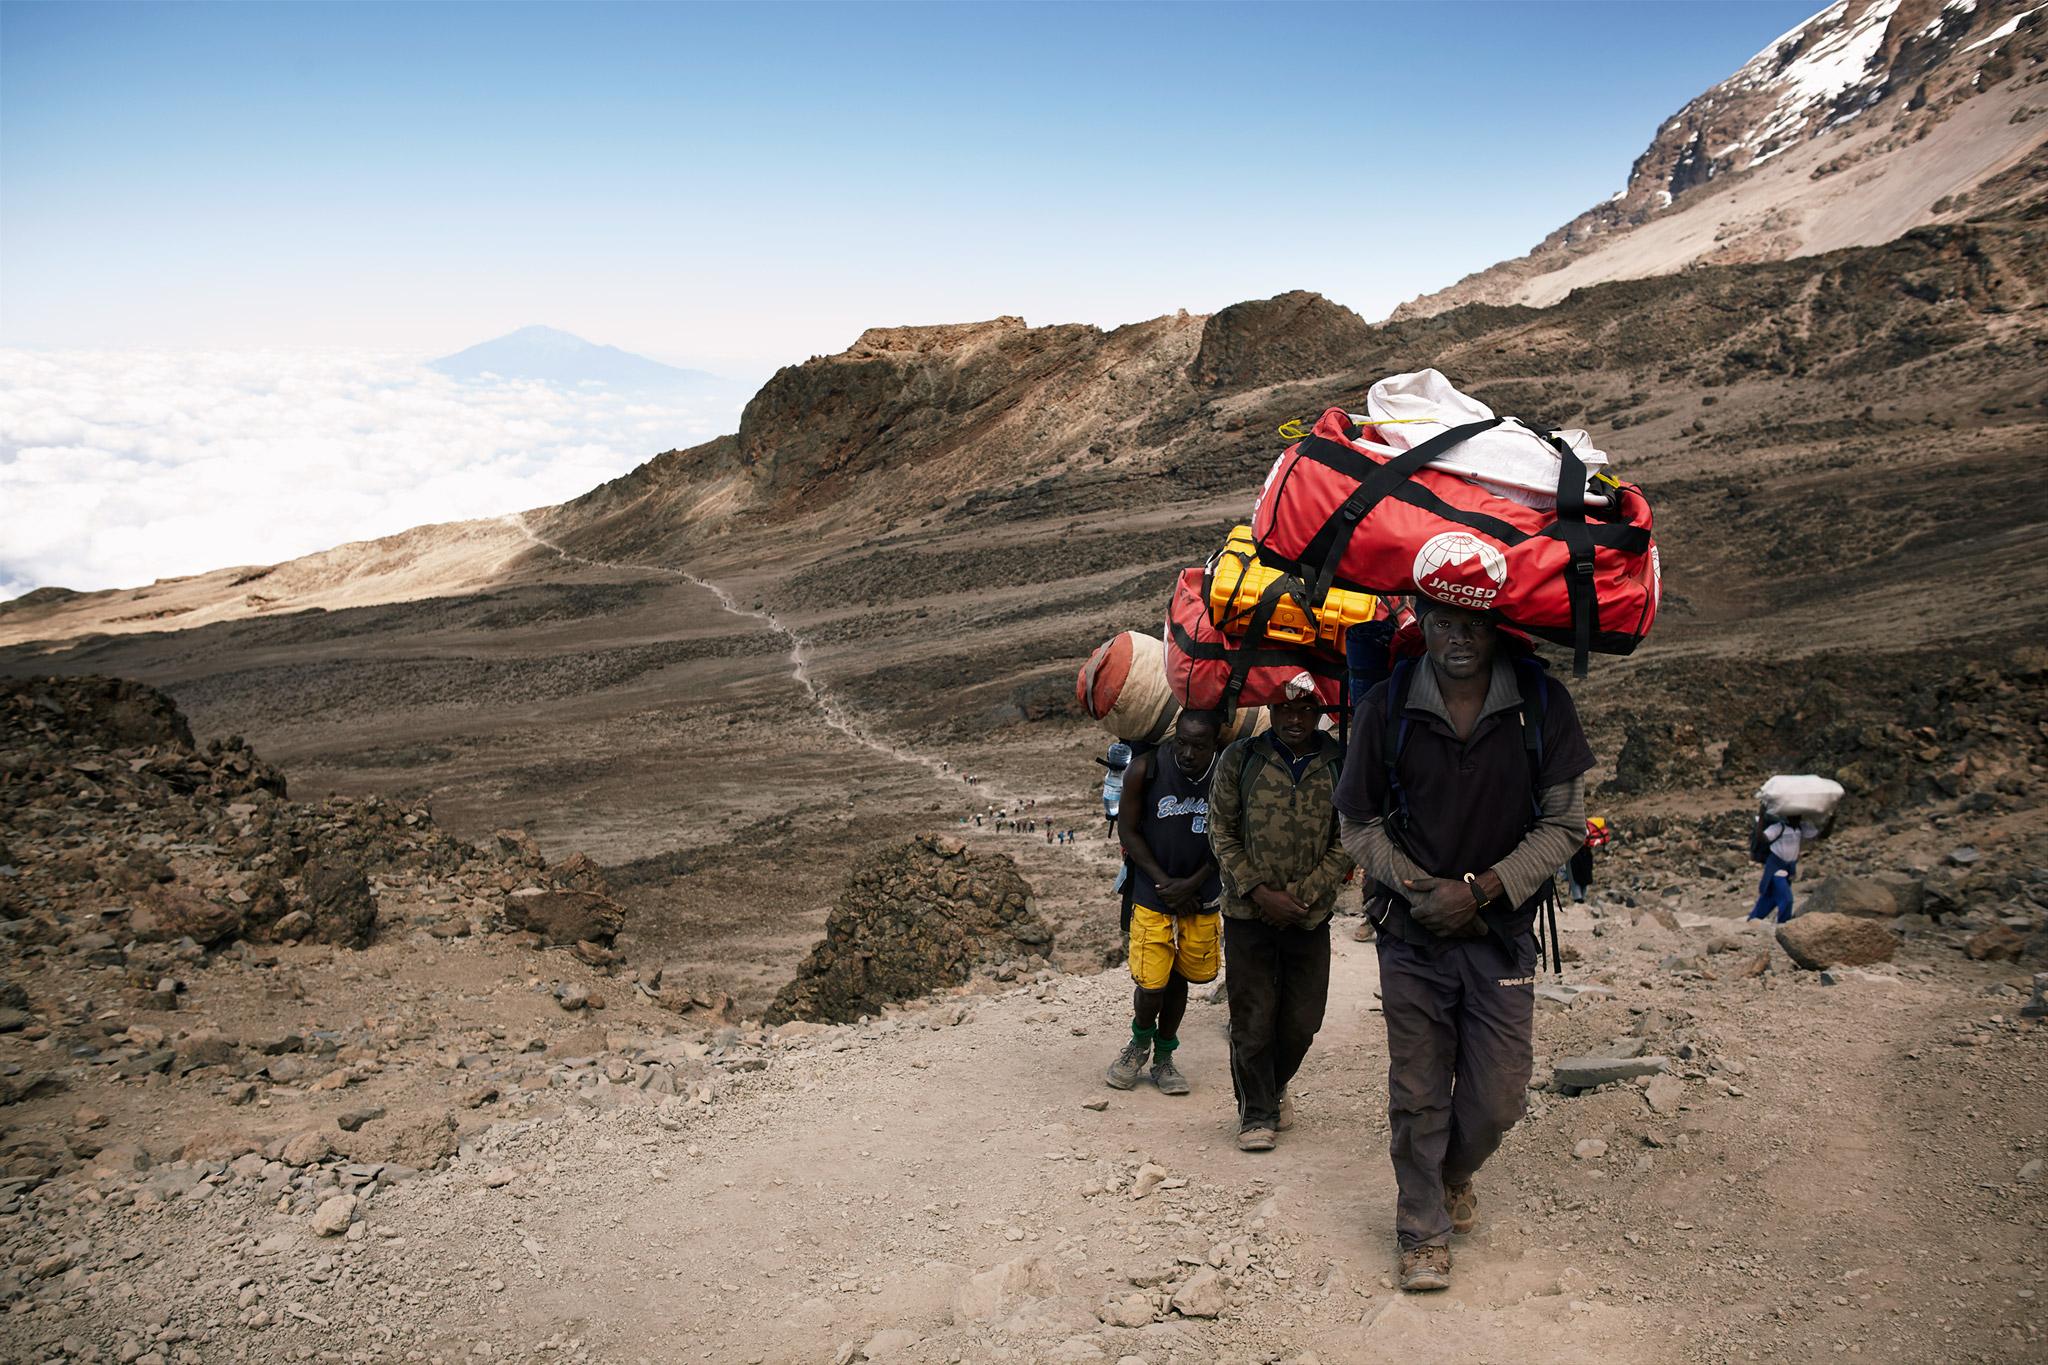 Porters of Kilimanjaro carrying luggage